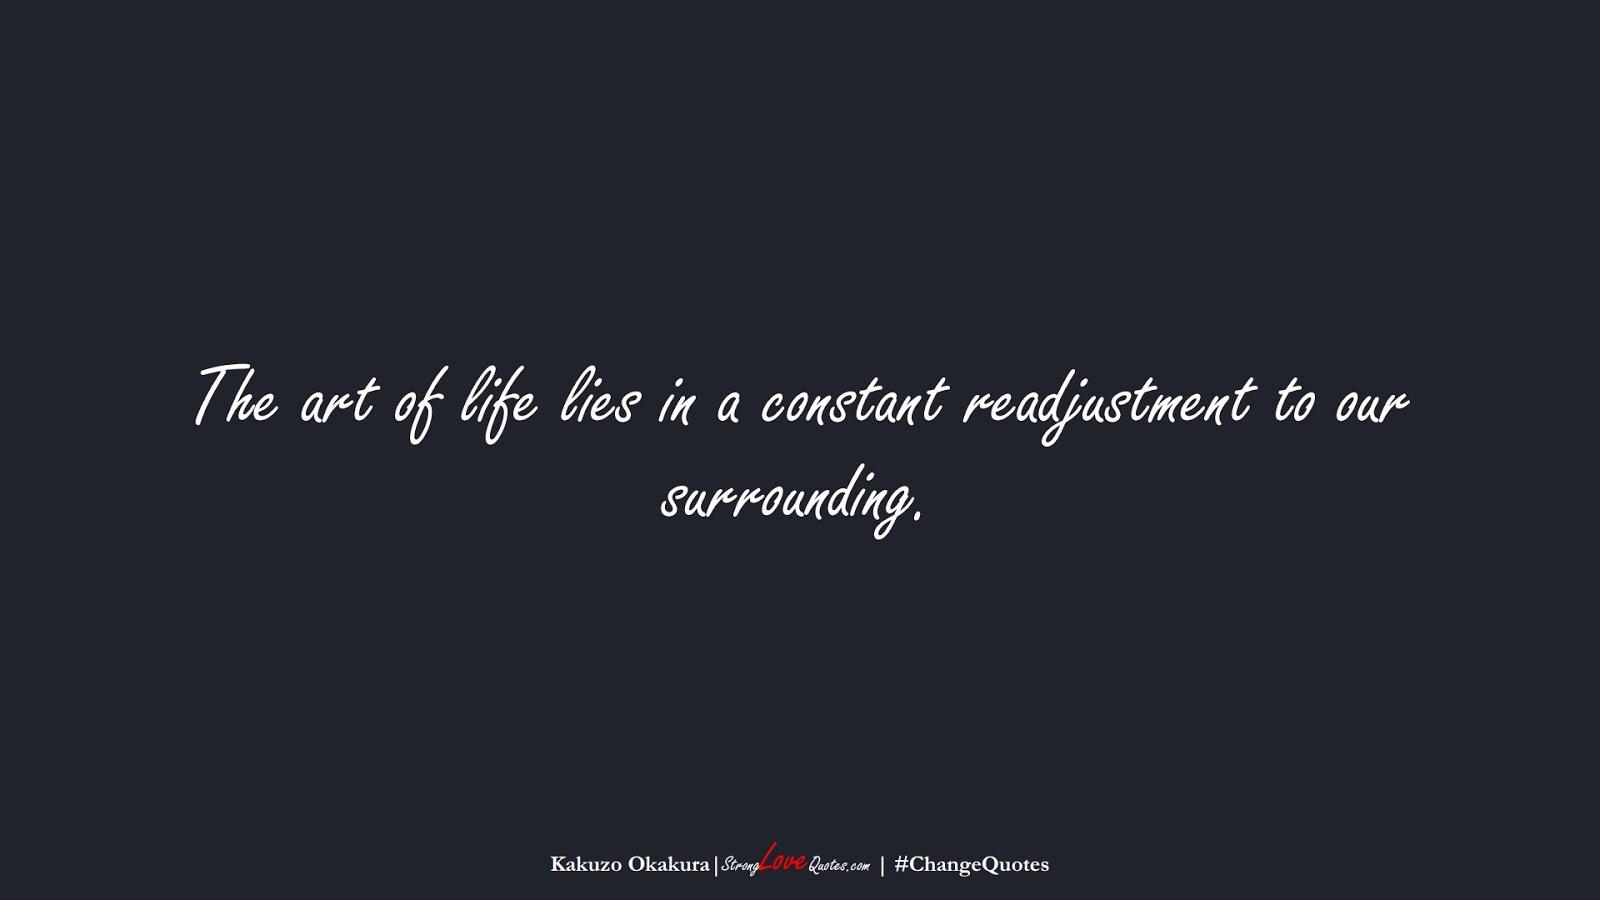 The art of life lies in a constant readjustment to our surrounding. (Kakuzo Okakura);  #ChangeQuotes